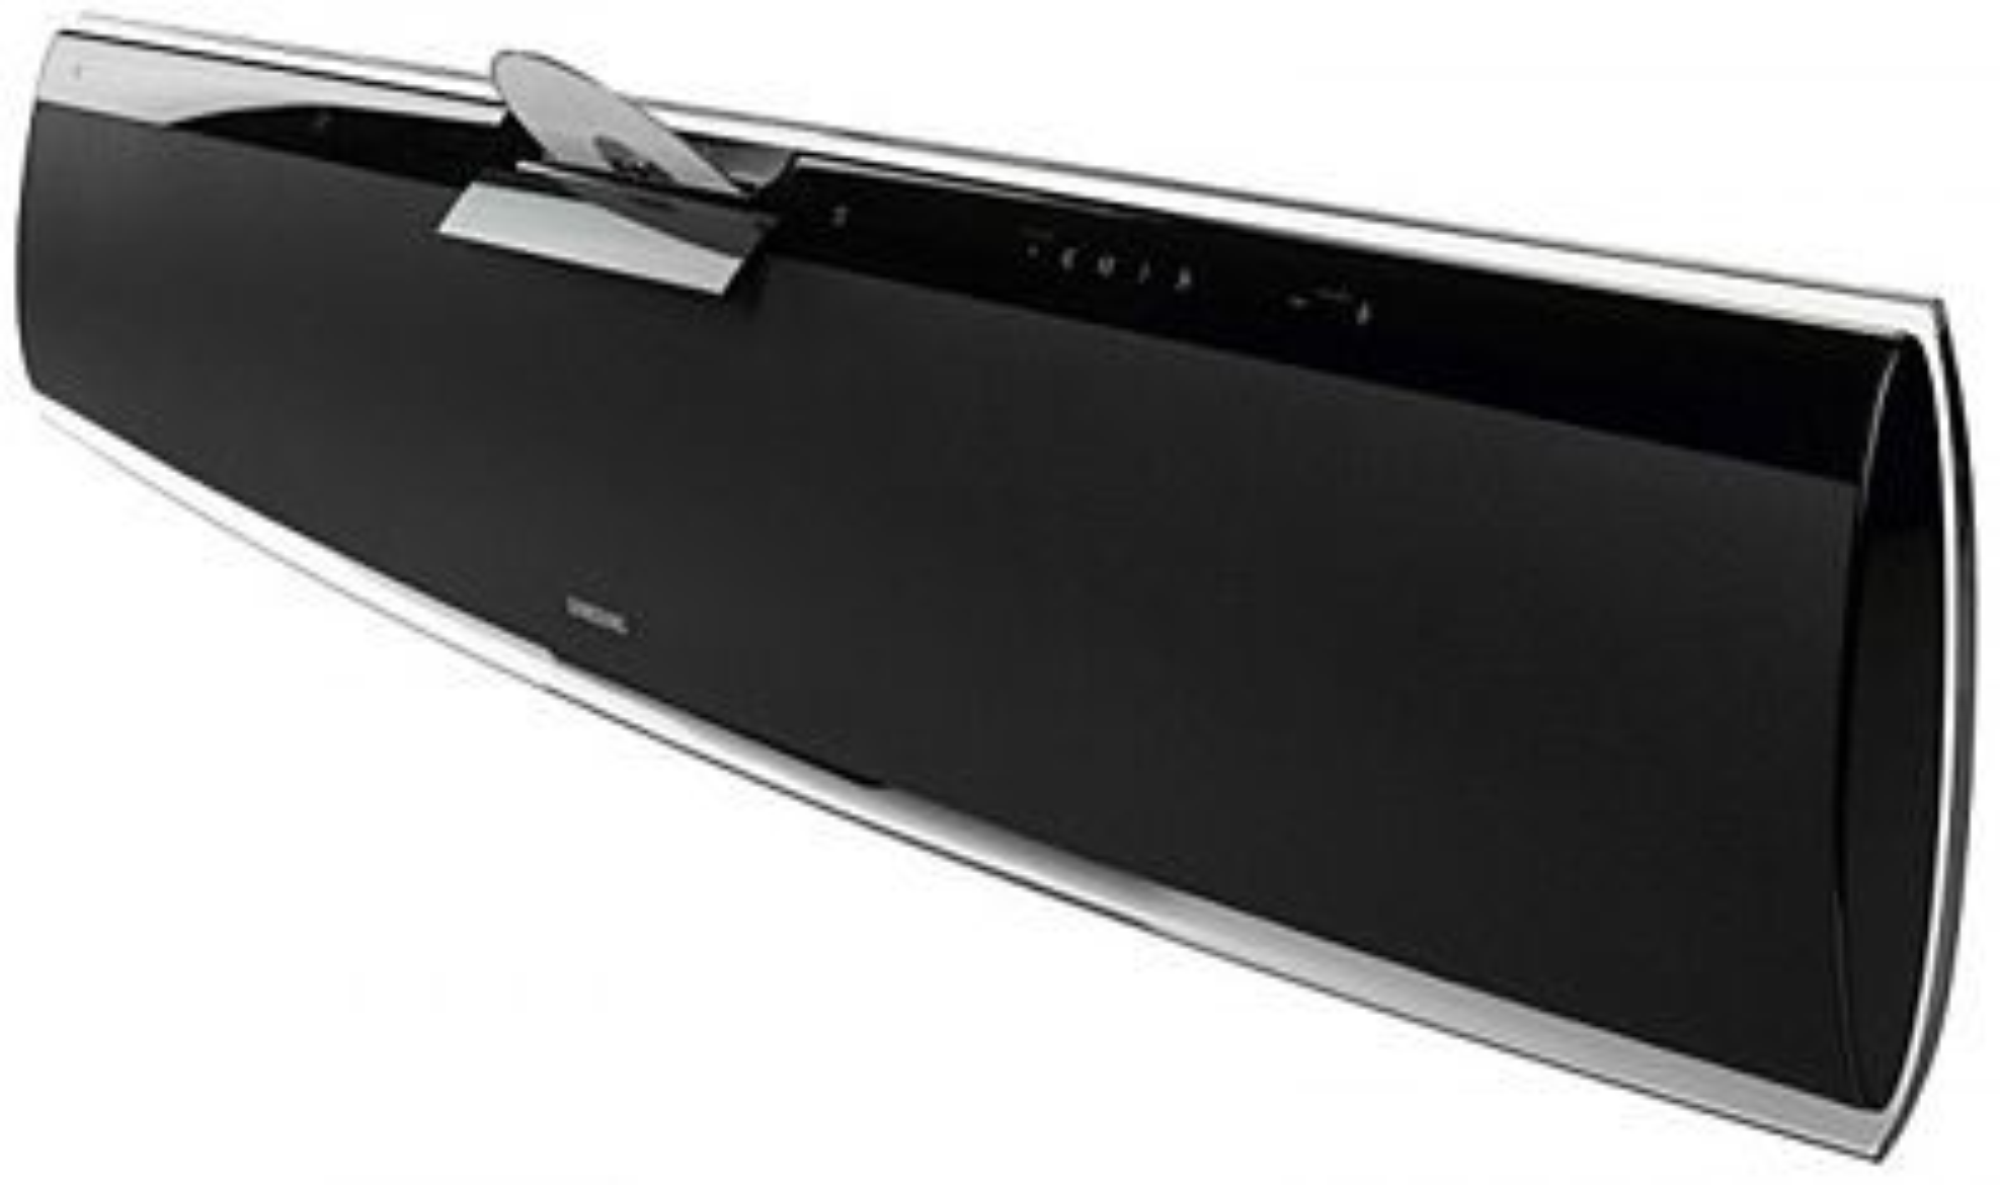 Samsung HT-X810 - lydplanke.